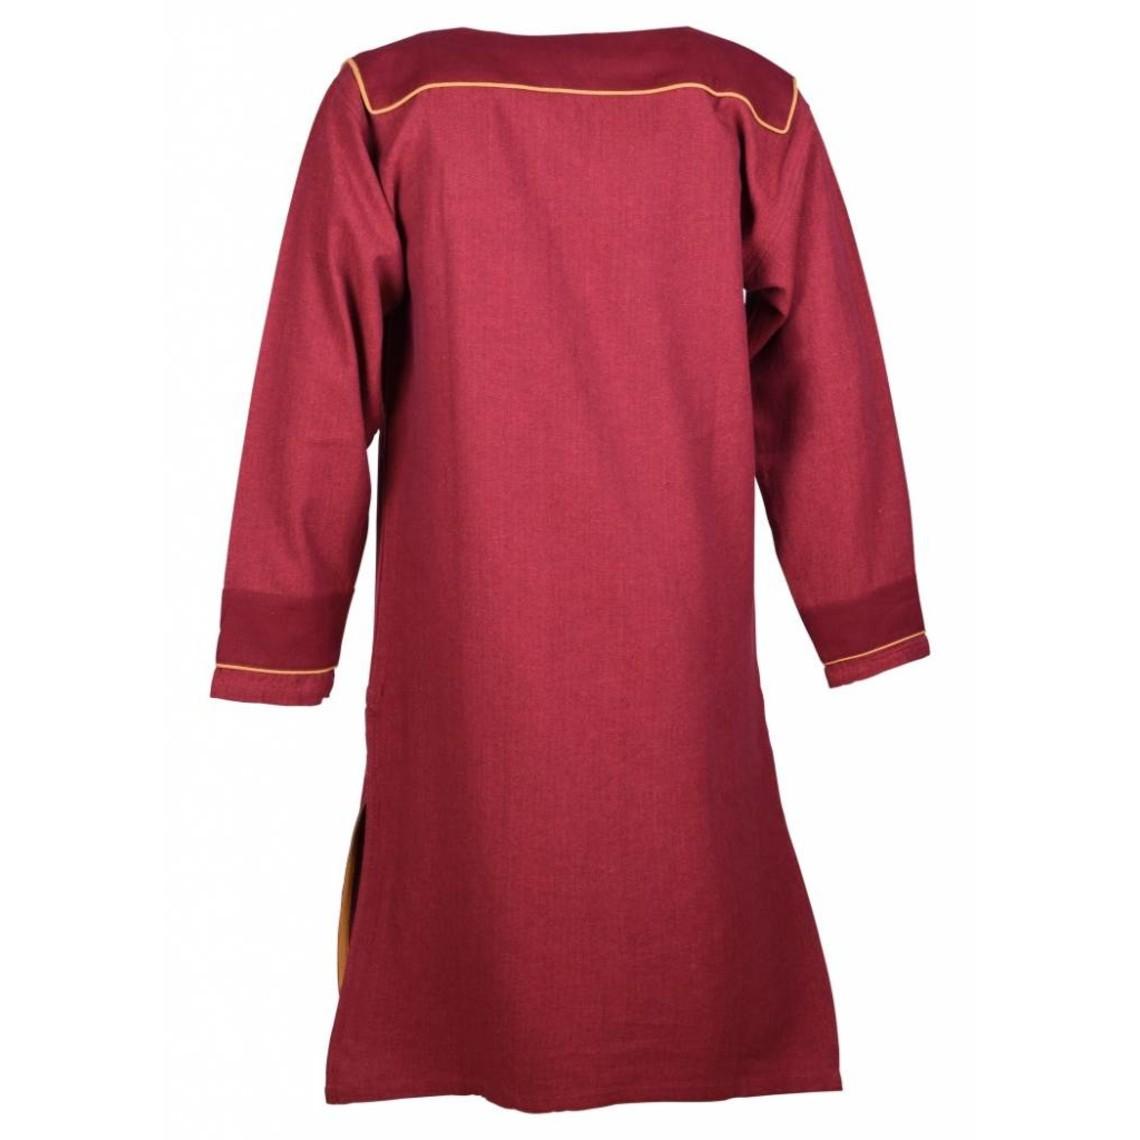 Motivo de espiga de la túnica Thorsberg, rojo.